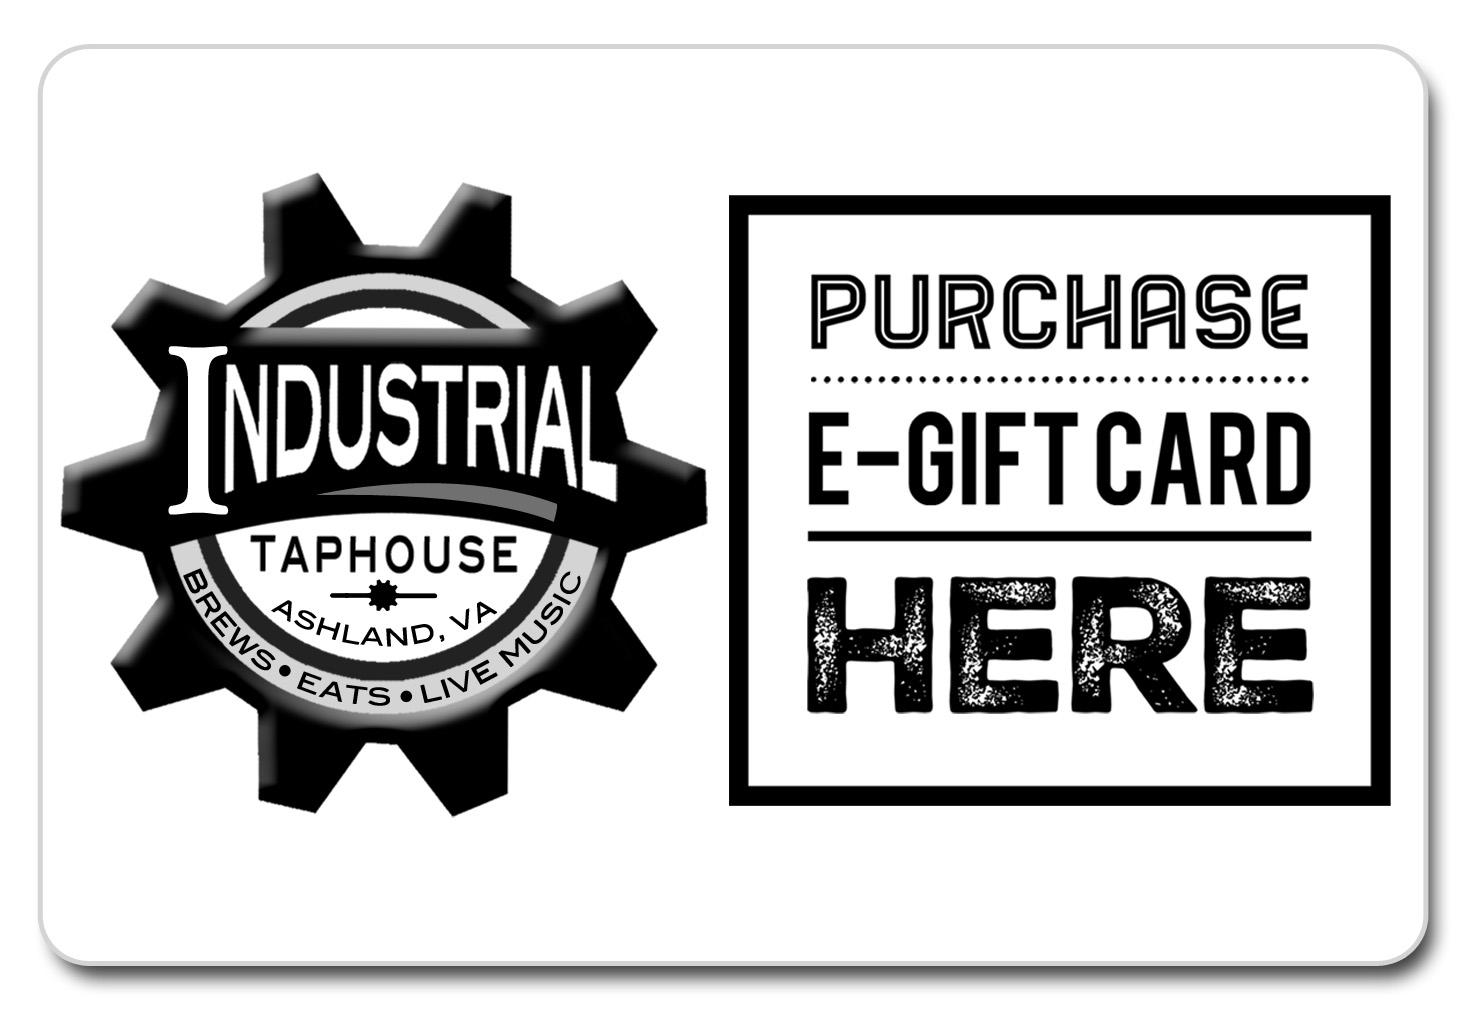 gift card, industrial taphouse, craft beer, burgers, best restaurant, cotu, ashland va, rva, richmond va